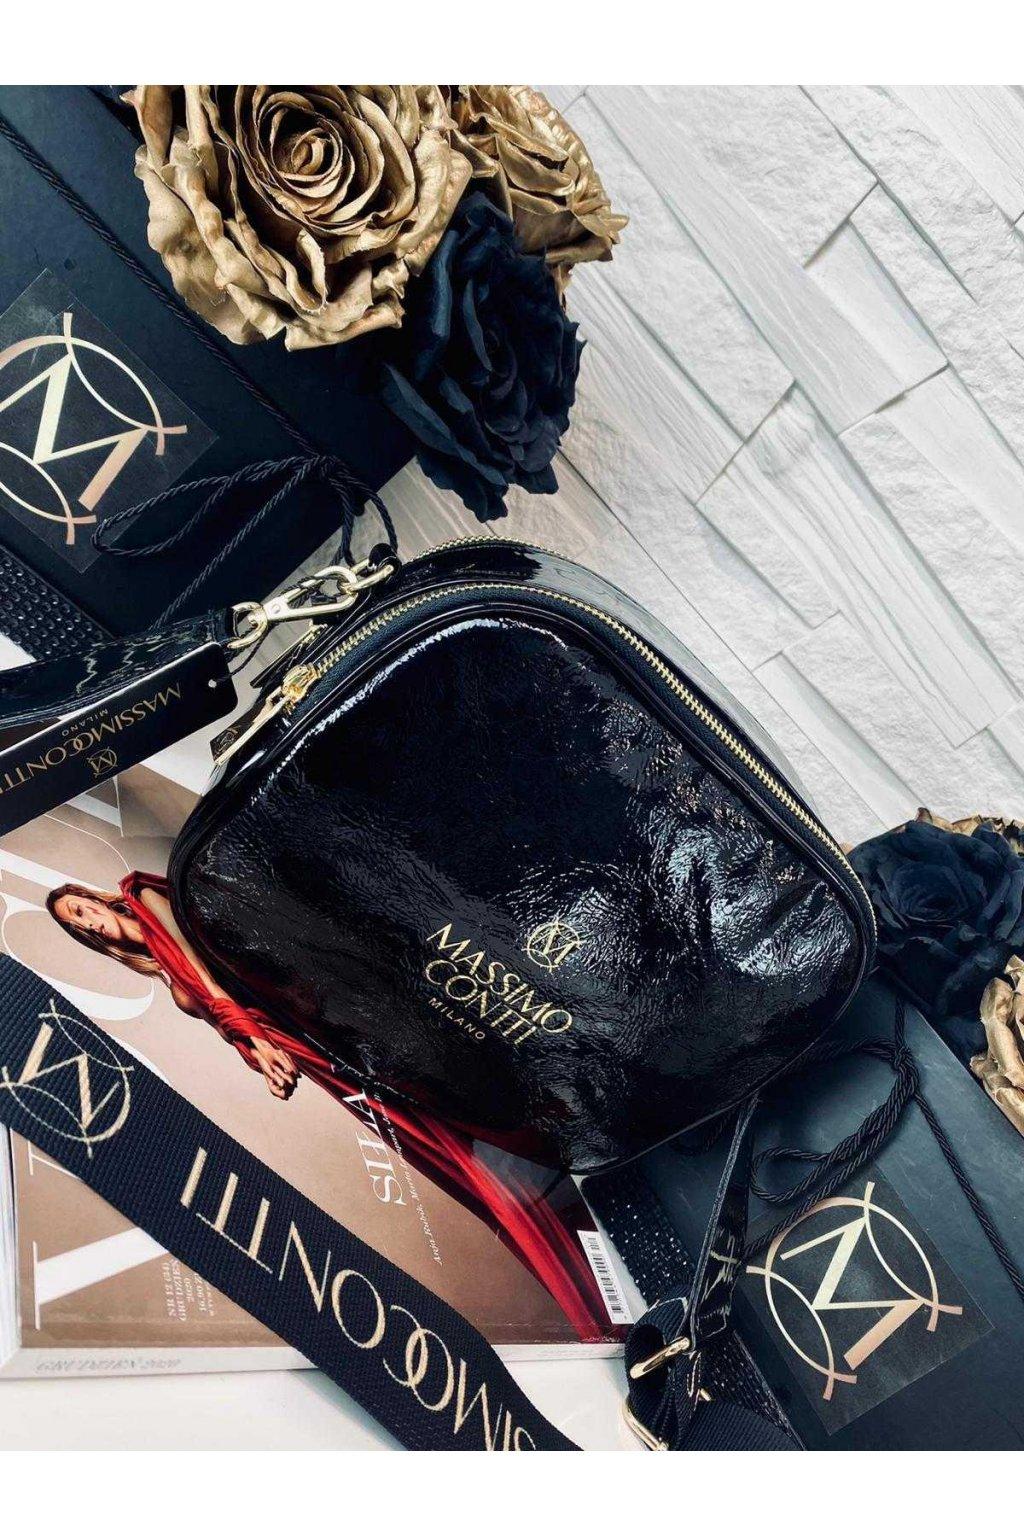 kabelka CROSSBODY massimo contti styl italy eko kůže koženka eleganto